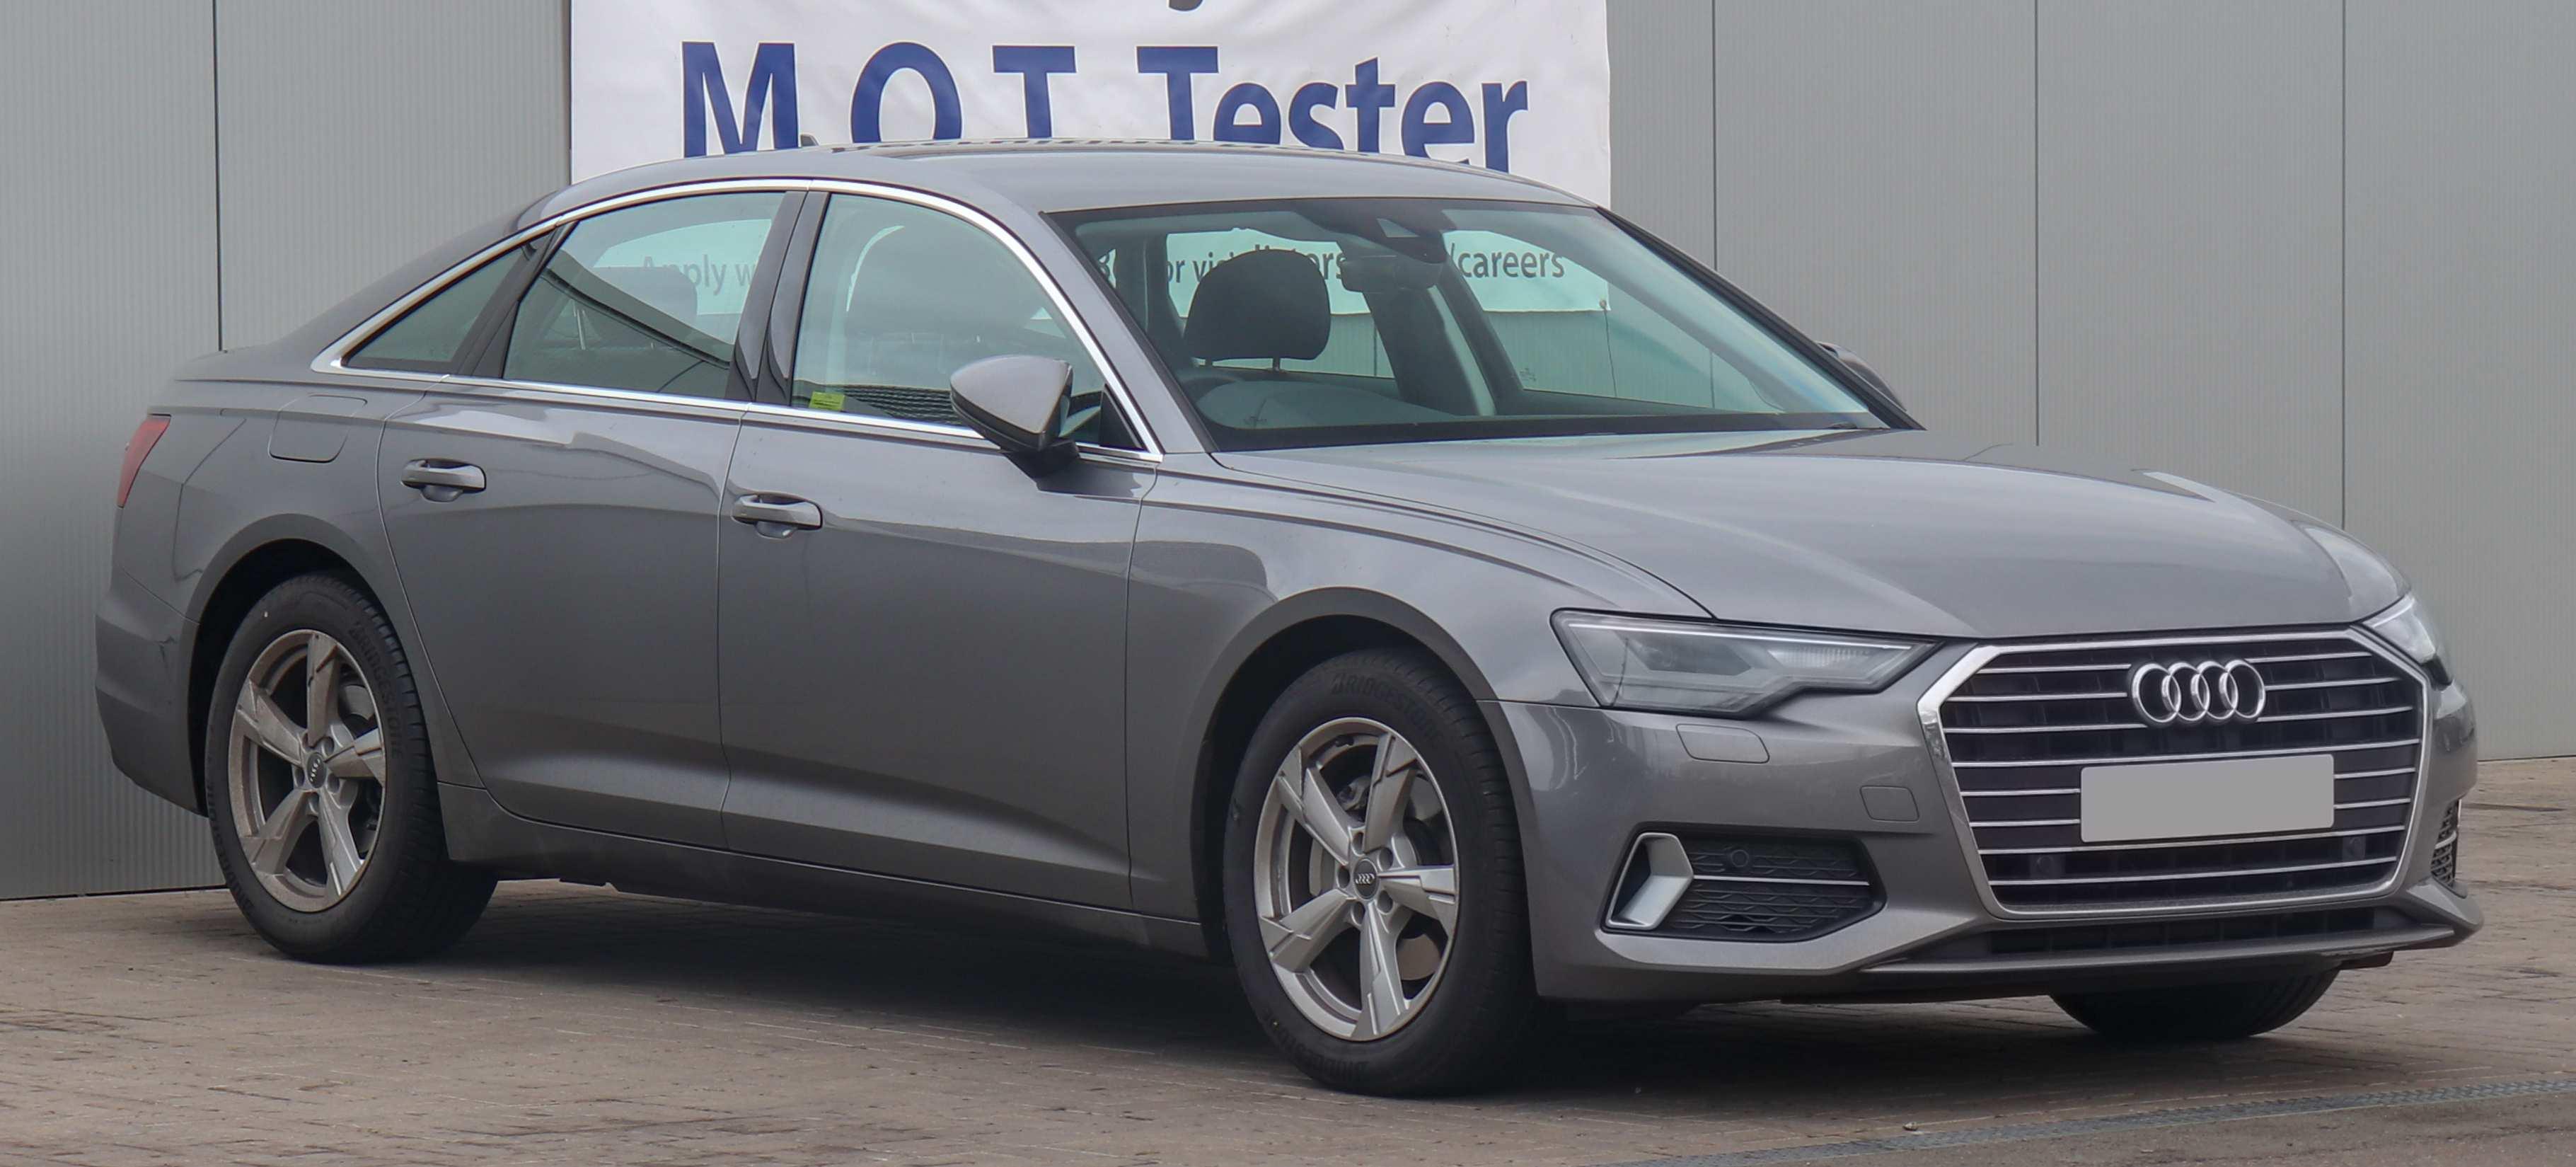 77 Gallery of Best A6 Audi 2019 Interior Rumors Price with Best A6 Audi 2019 Interior Rumors